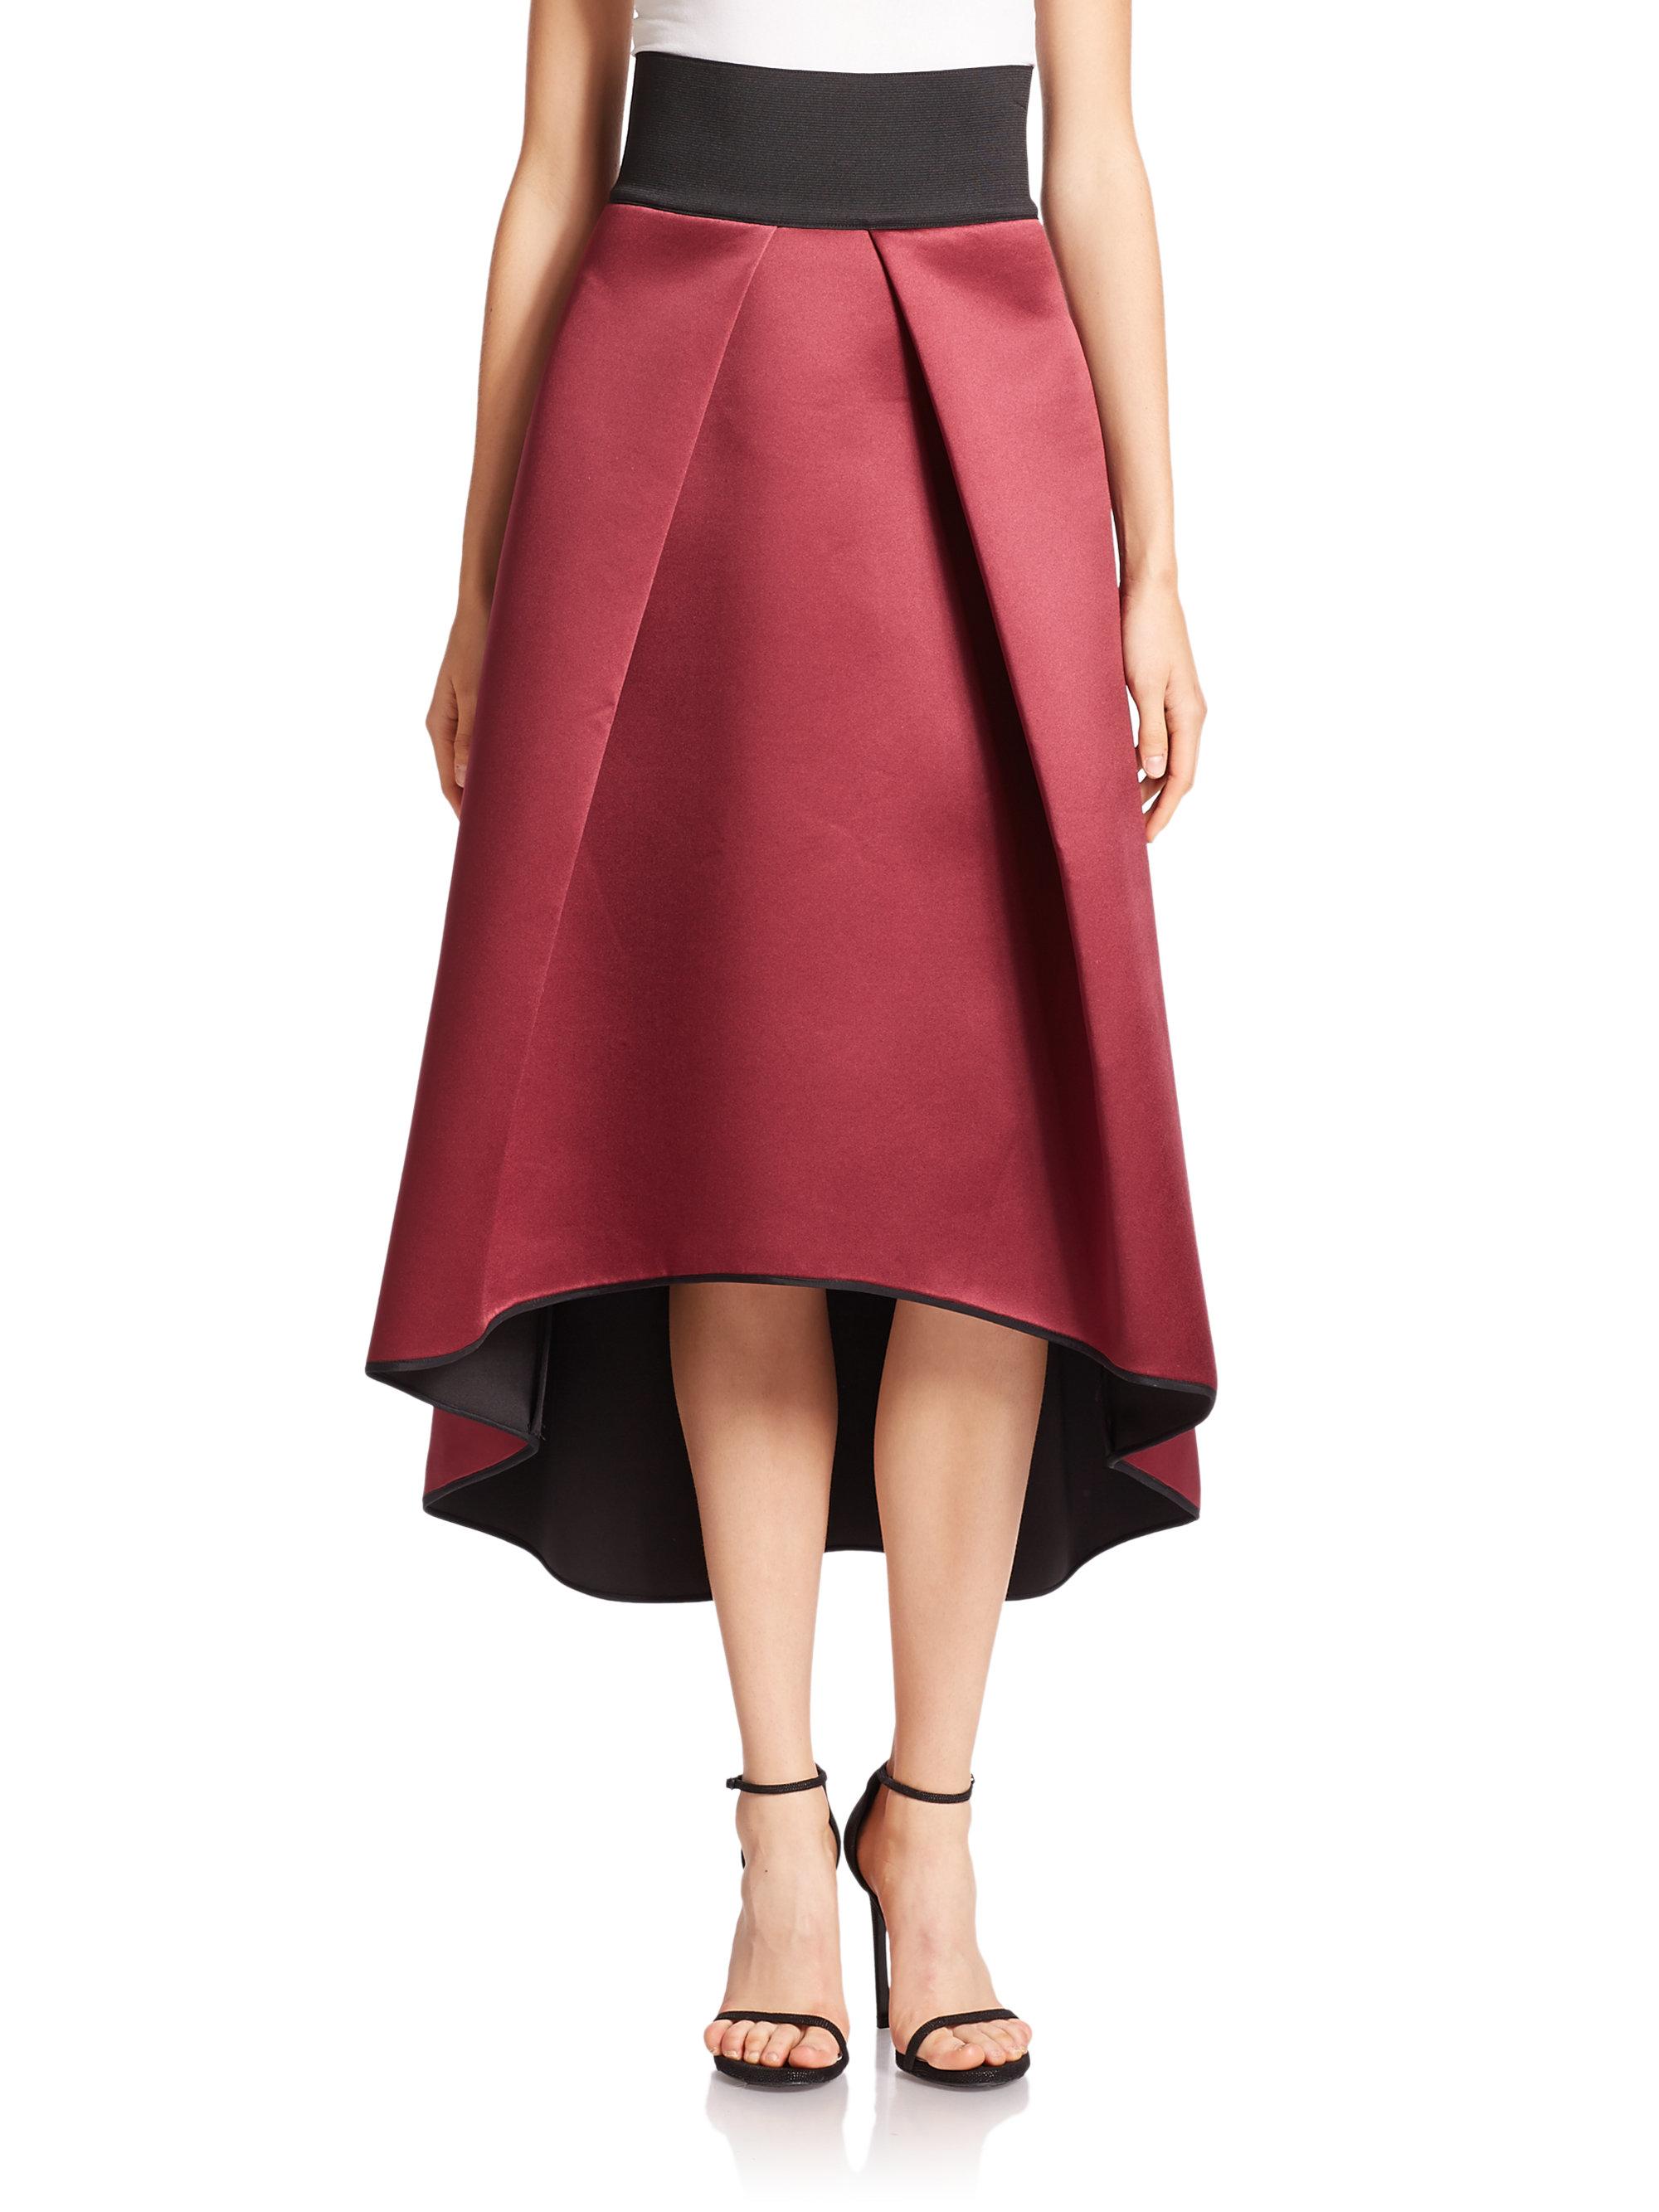 dae042c49b0f0f MILLY Duchess Satin Tucked Ball Skirt in Purple - Lyst